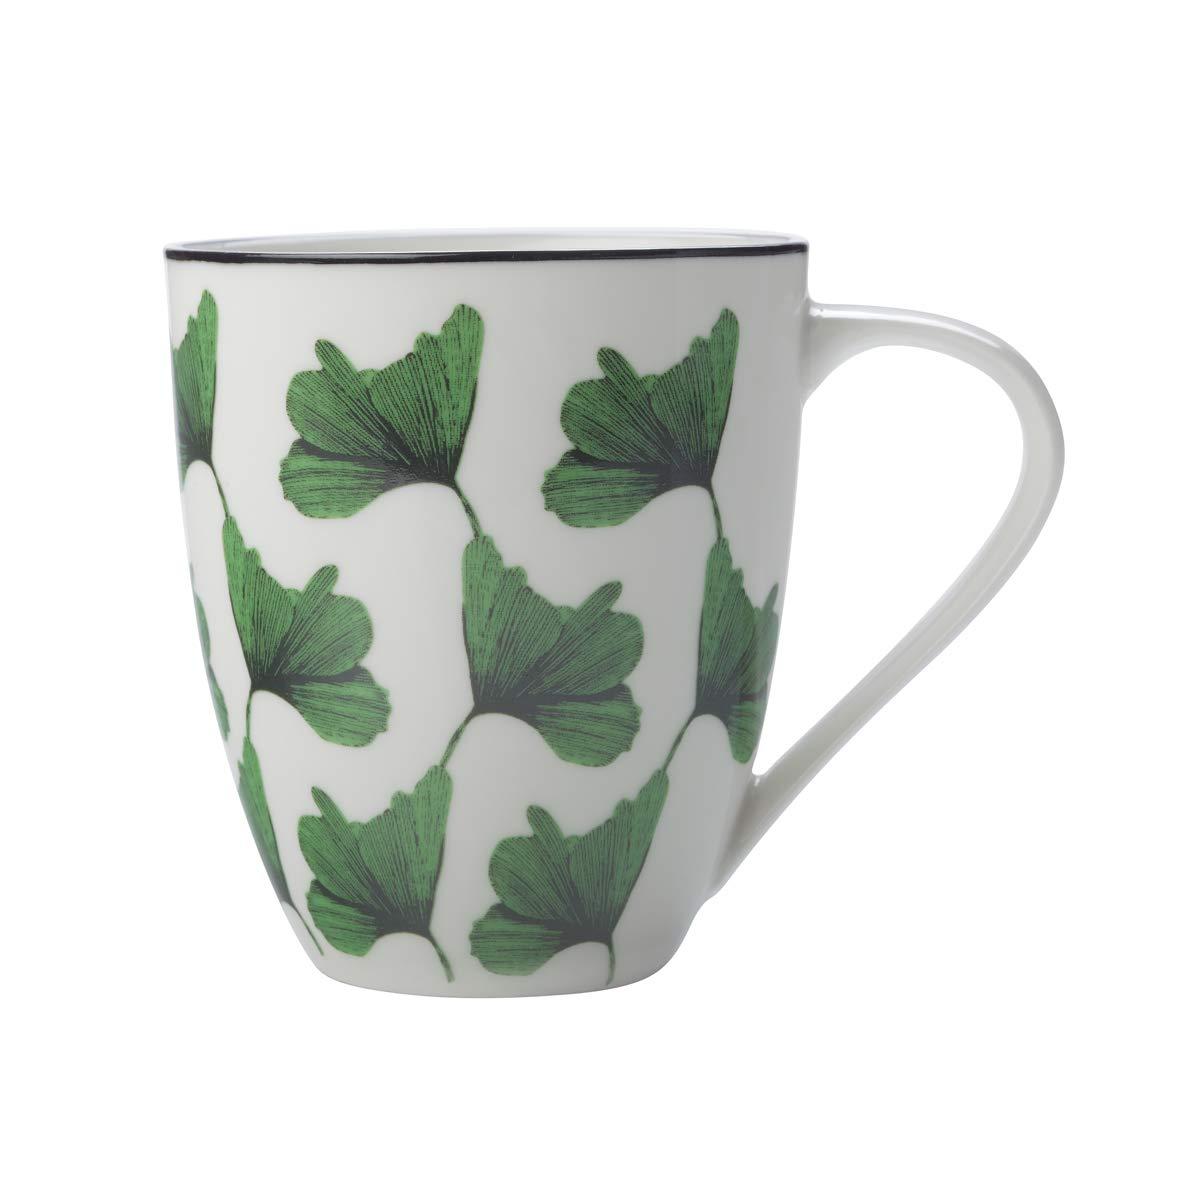 Christopher Vine – The Sanctuary Mug In Porcellana 500ml